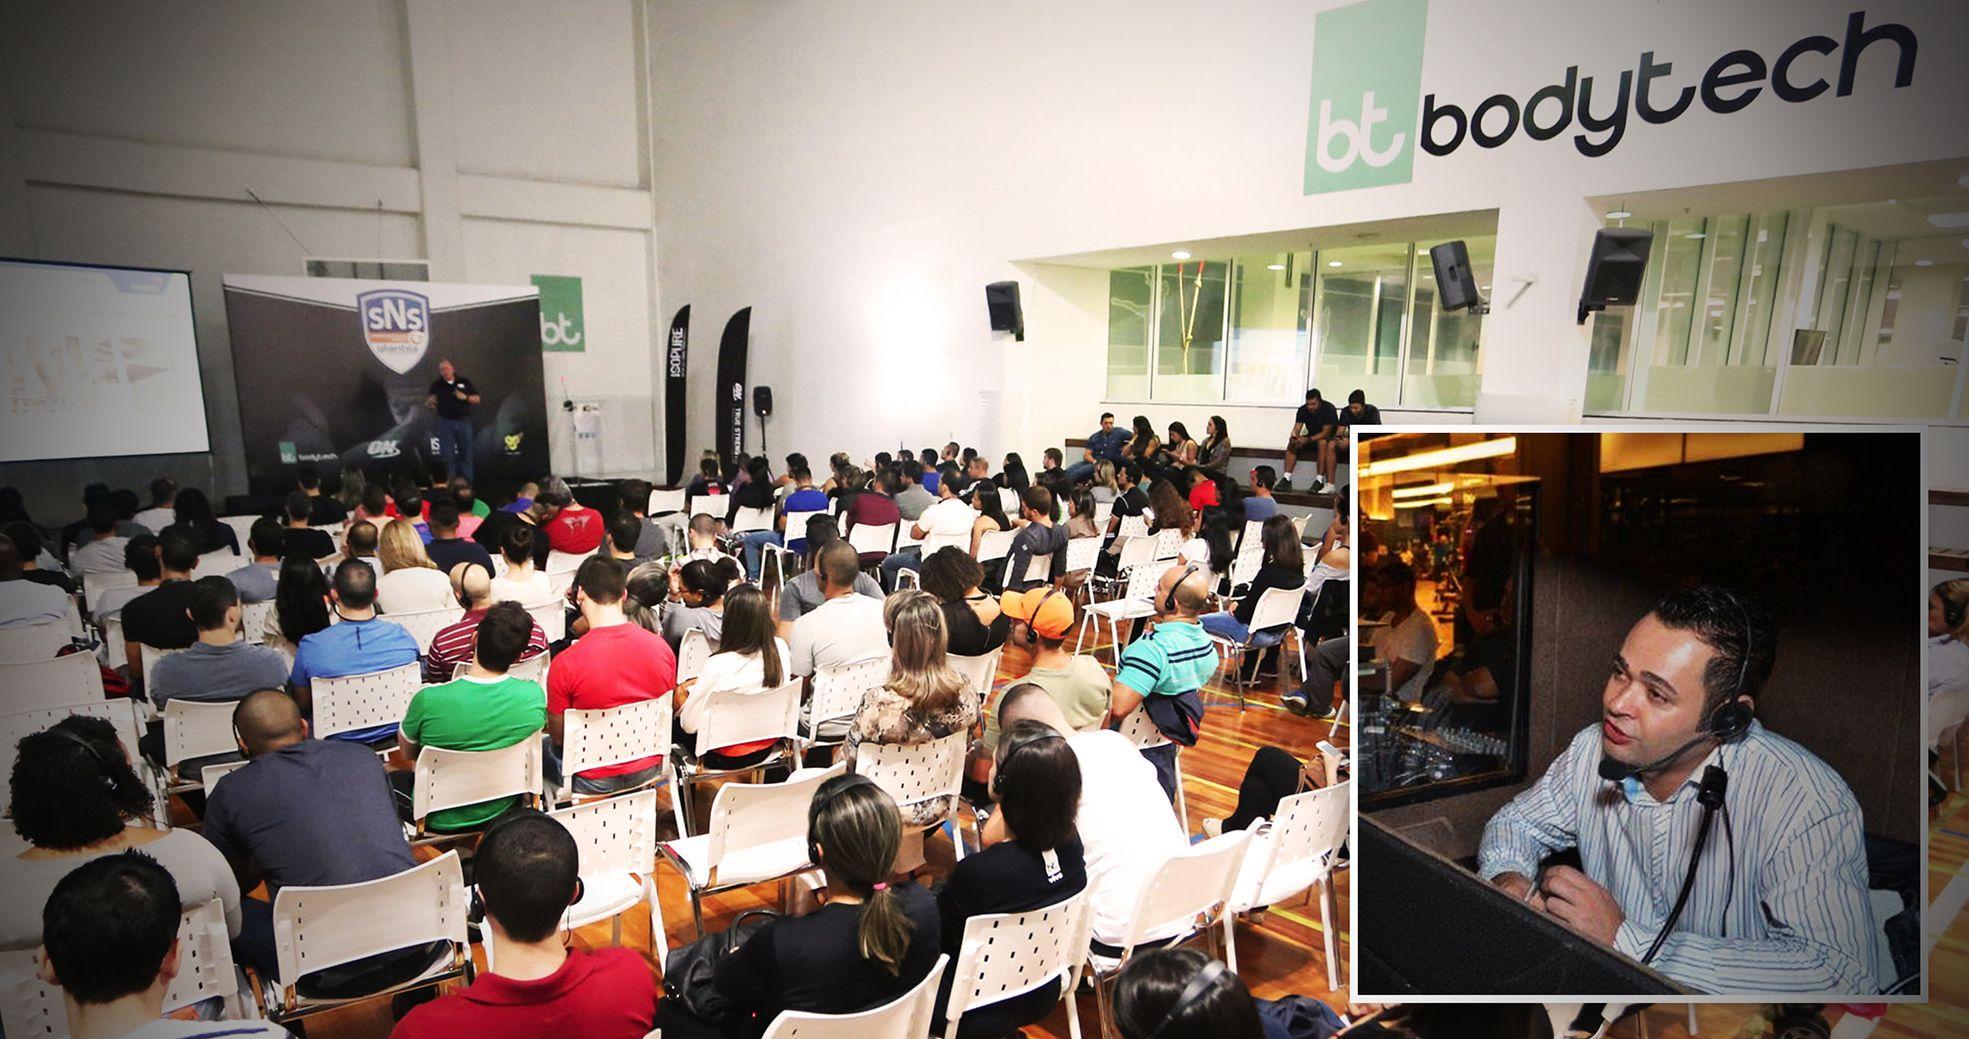 Evento Corporativo - Palestra Bodytech + Glanbia SNS7 - Agência DosReis Live Marketing